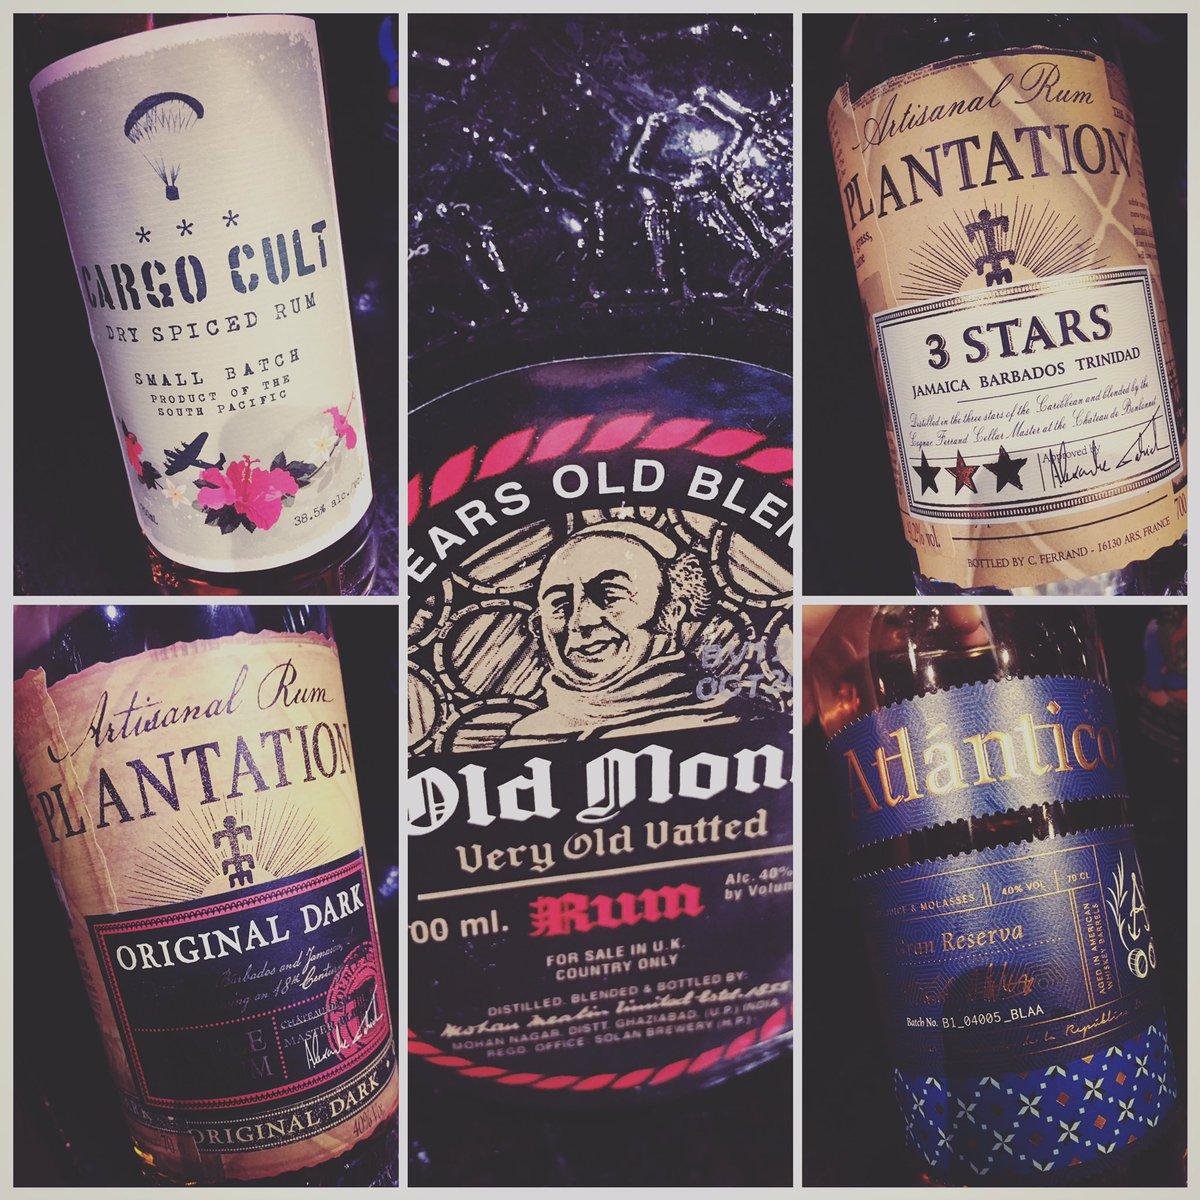 It's not all beer & gin! Check out our new range of rum. #oldmonk #plantationrum #cargocultrum #atlanticorum #artisanspirits #craftrum #rum #darkrum #whiterumpic.twitter.com/ib0BDF1ME1